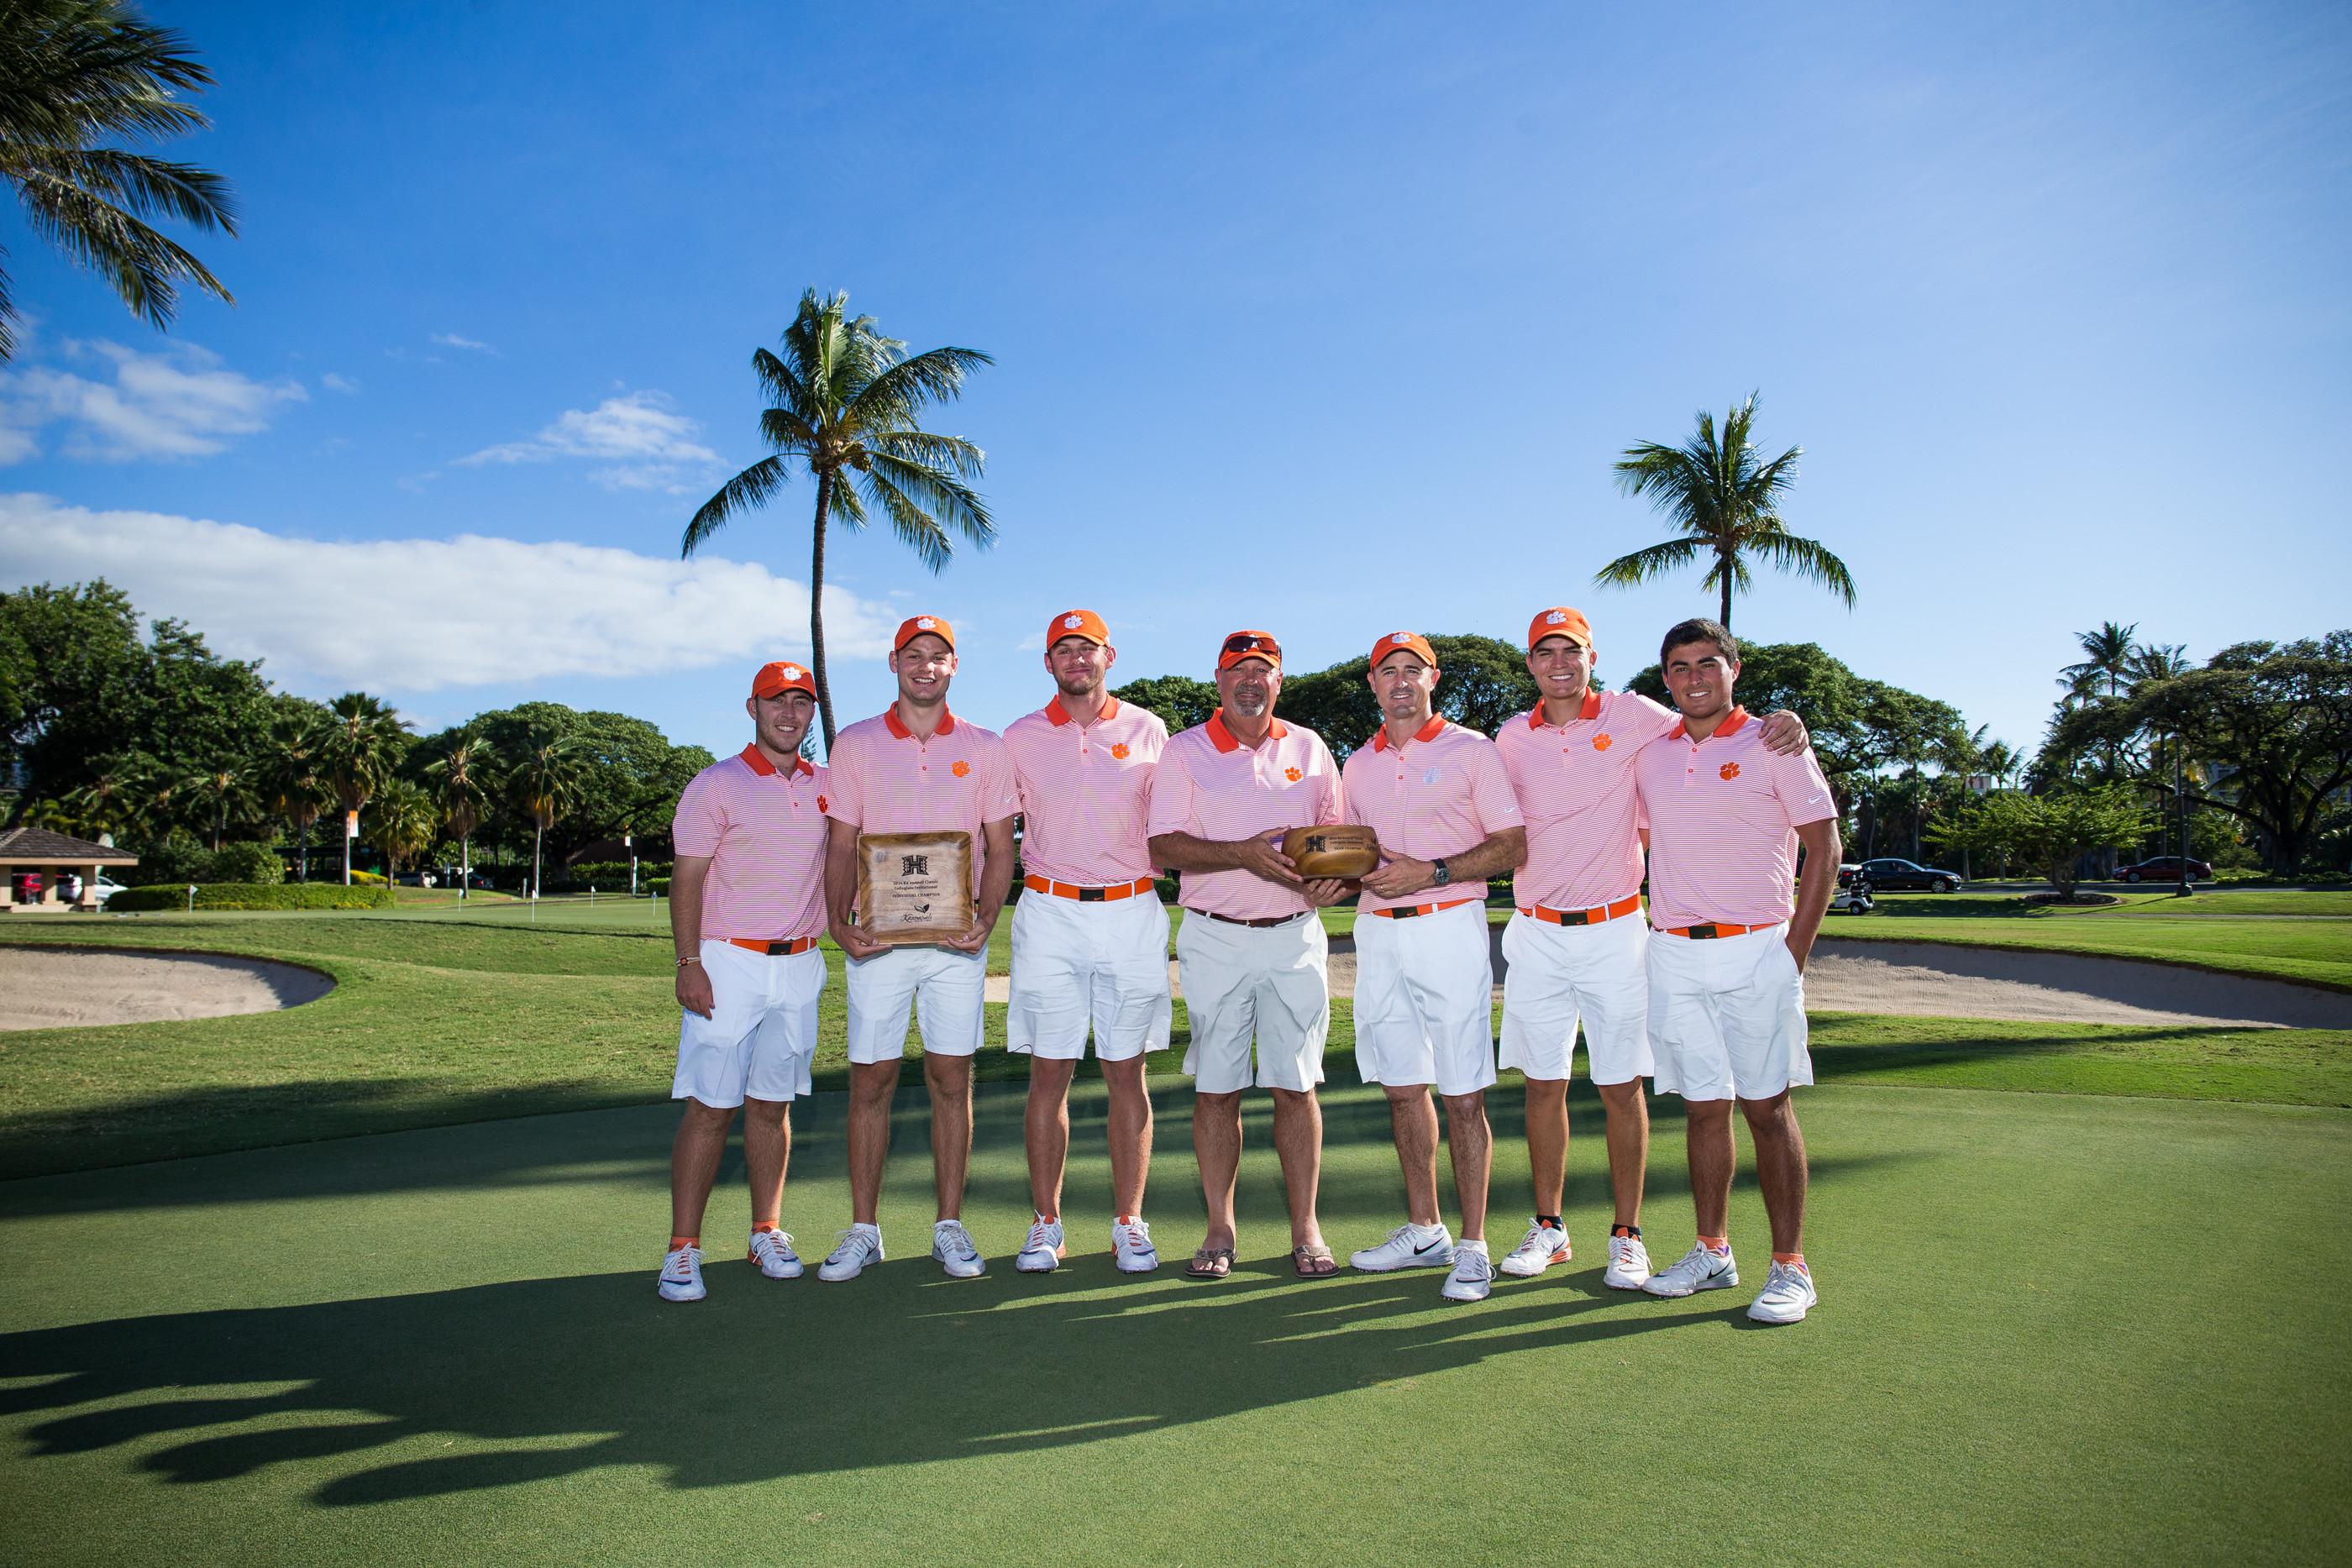 sfu mens golf team - HD2800×1867